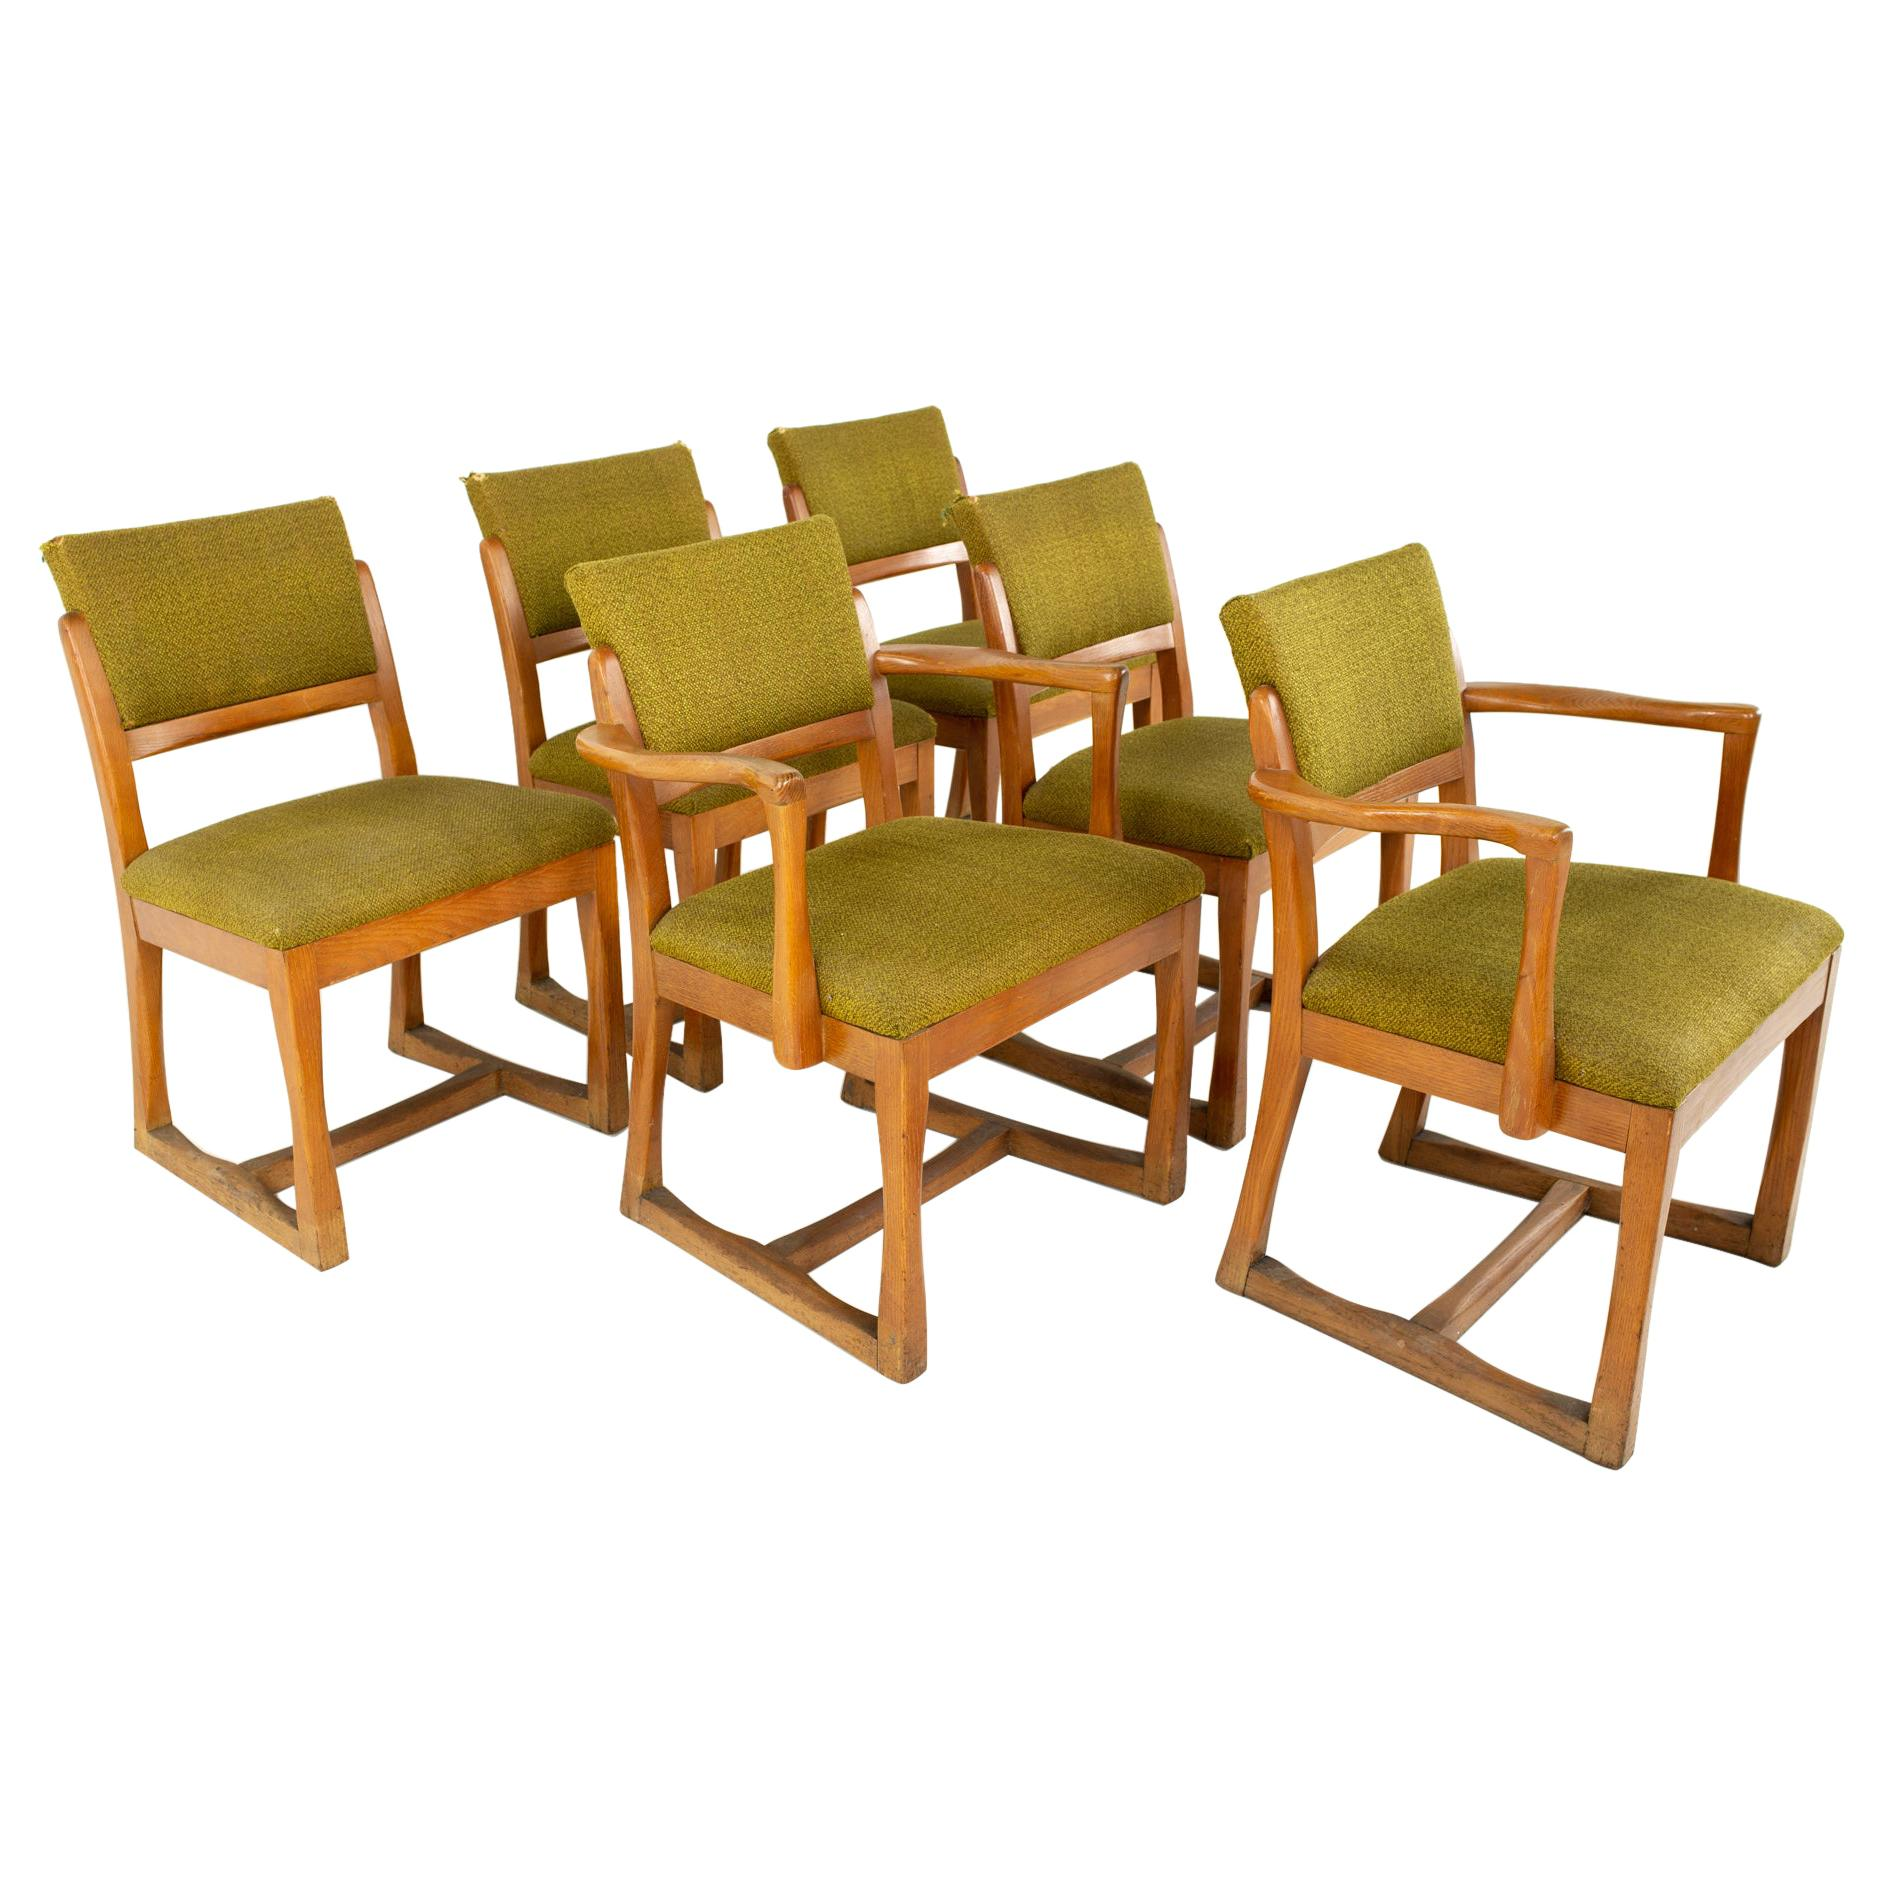 John Keal for Brown Saltman Style MCM Mahogany Dining Chairs, Set of 6